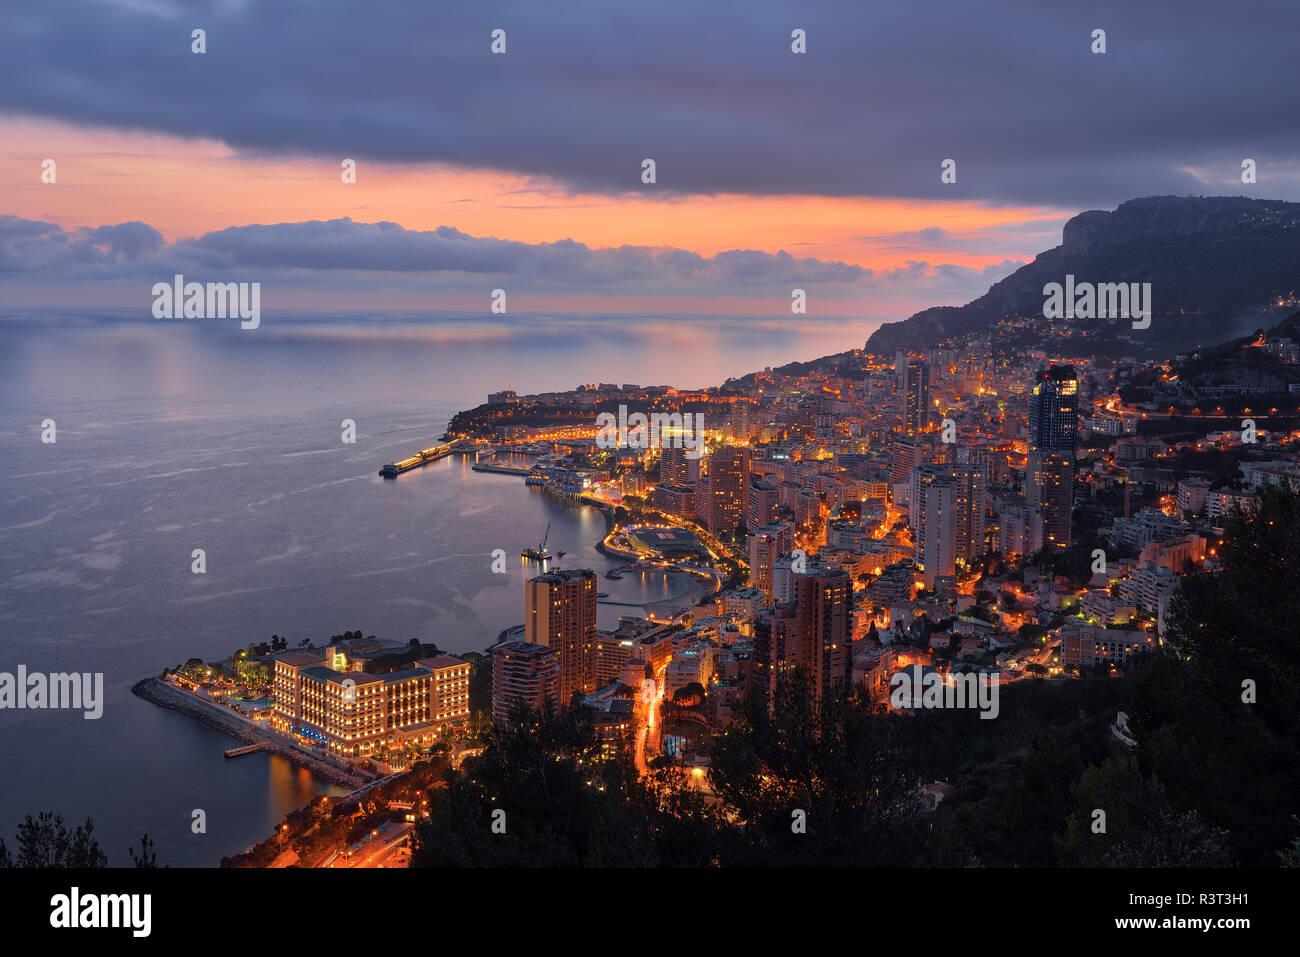 Monaco, Monte Carlo, view to lightes city at dusk Stock Photo